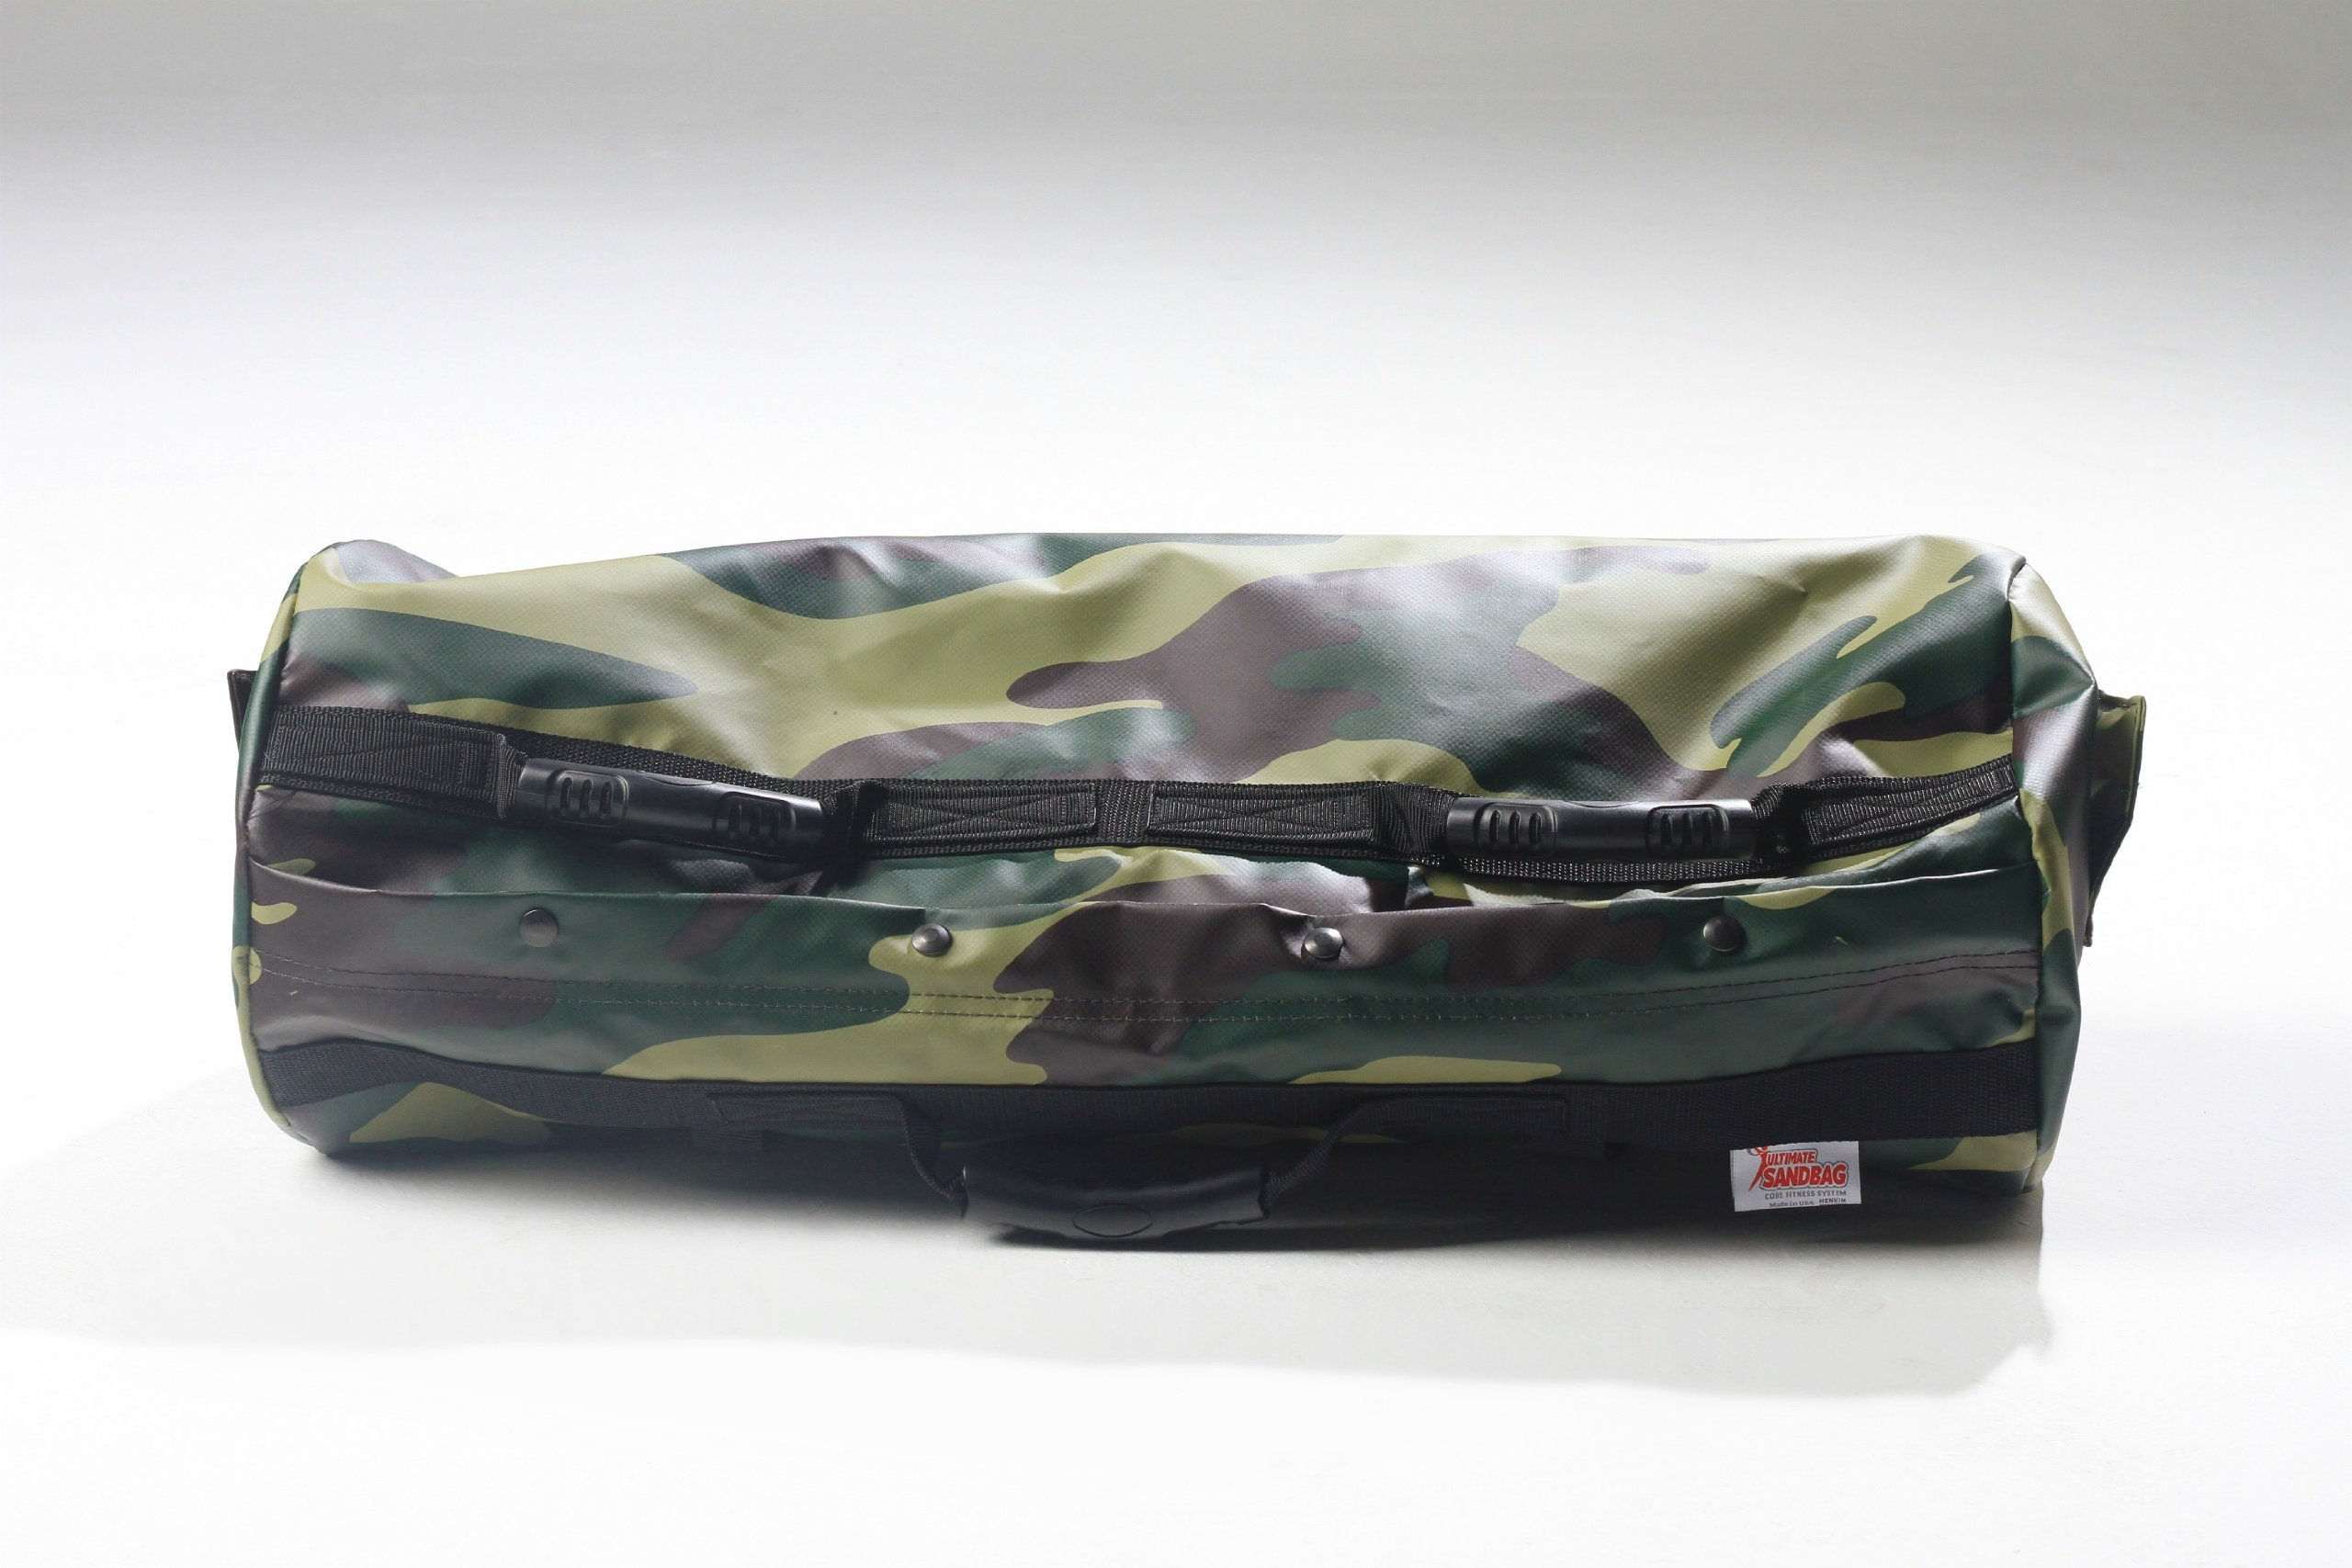 Ultimate Sandbag Training Strength Package - Camouflage Adjustable Fitness Sandbag with Filler Bags 40-80lbs by Ultimate Sandbag (Image #1)